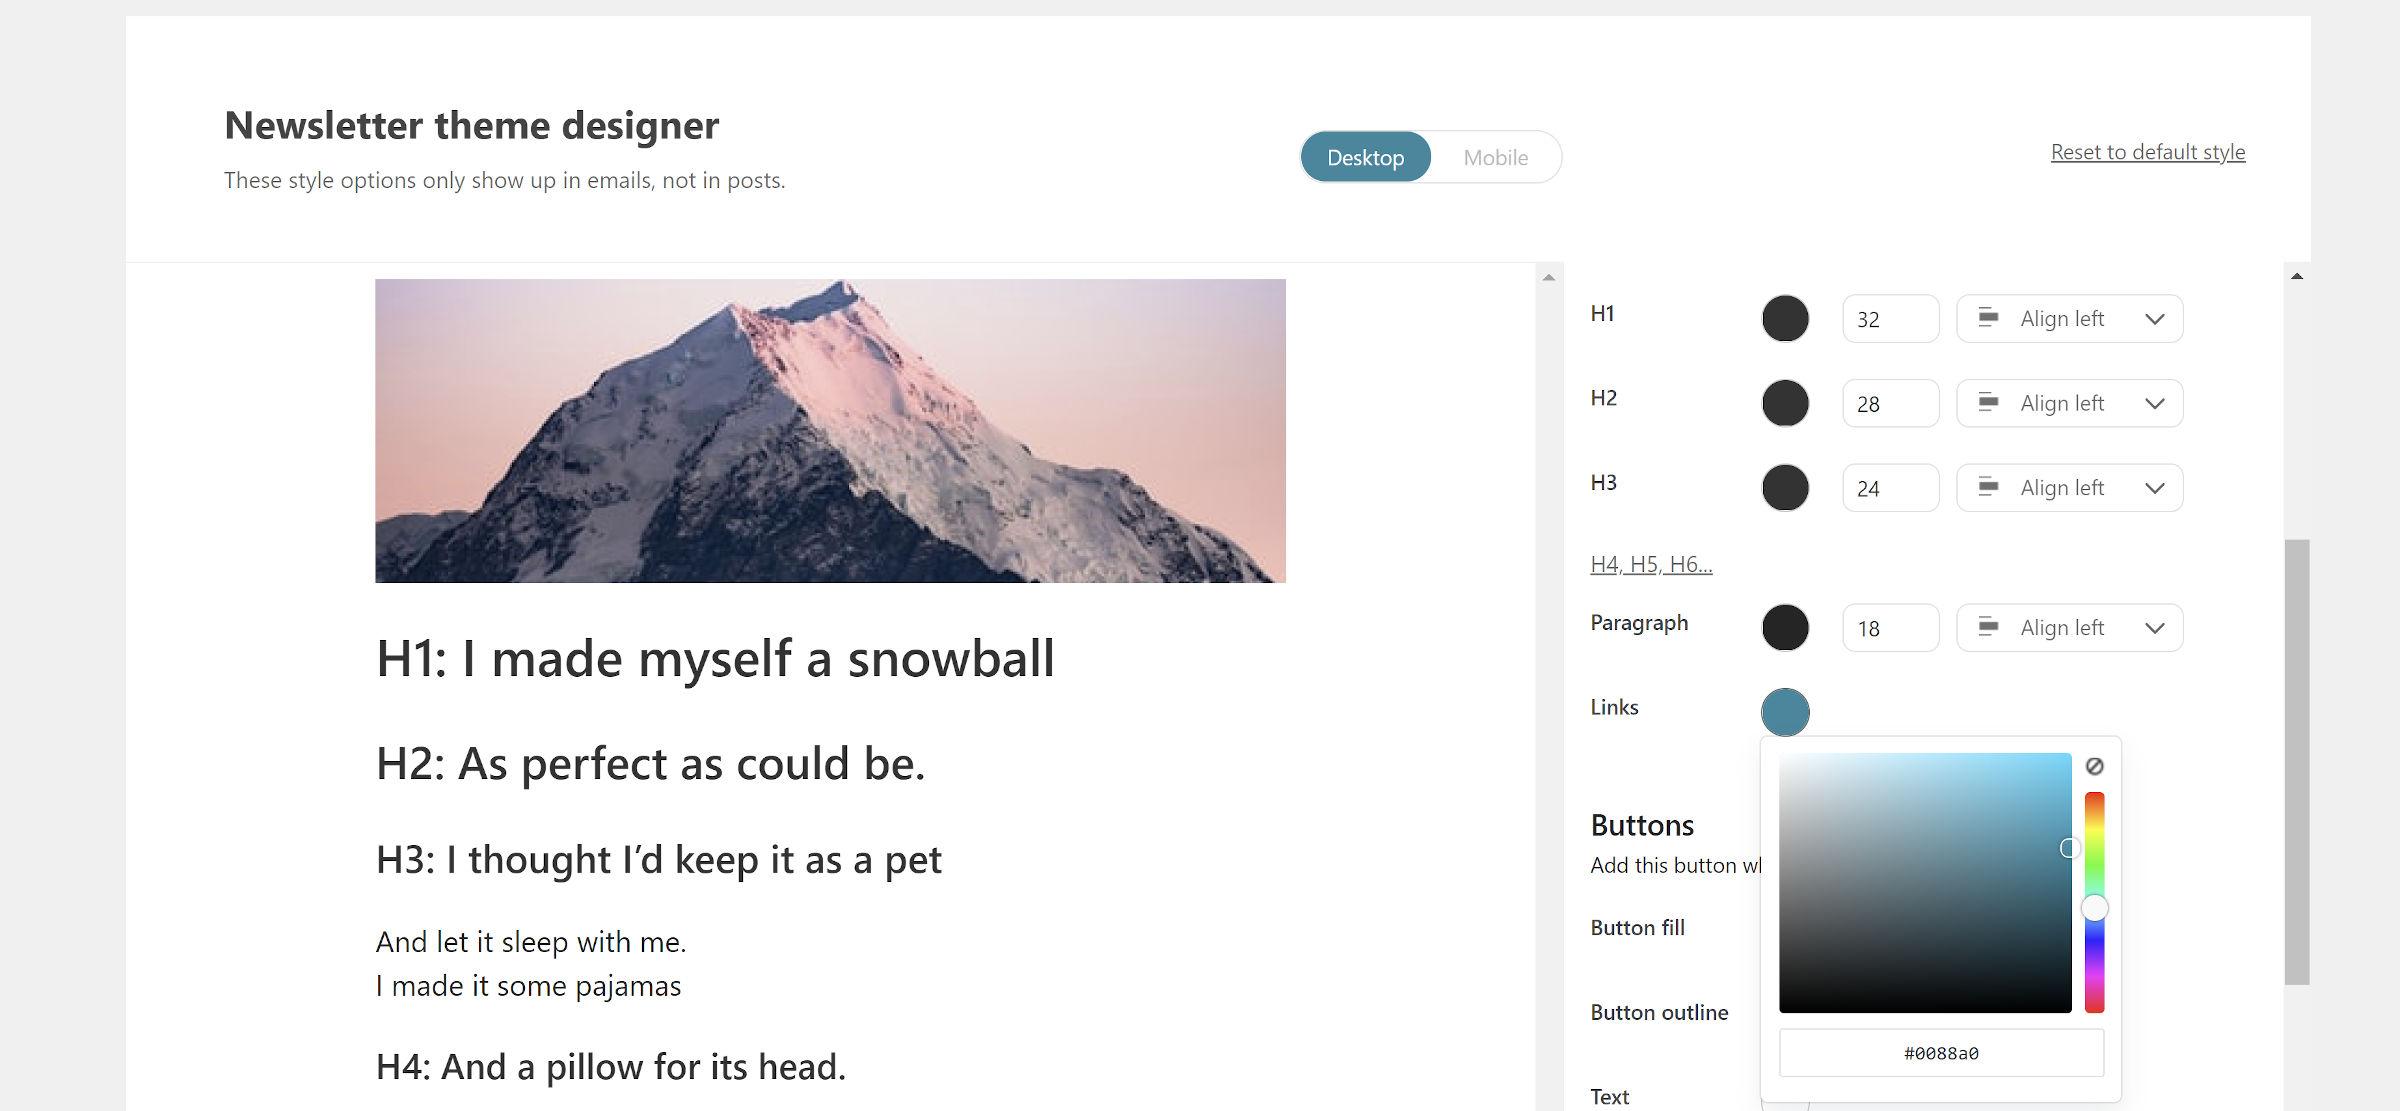 Newsletter theme design screen from the Newsletter Glue plugin.